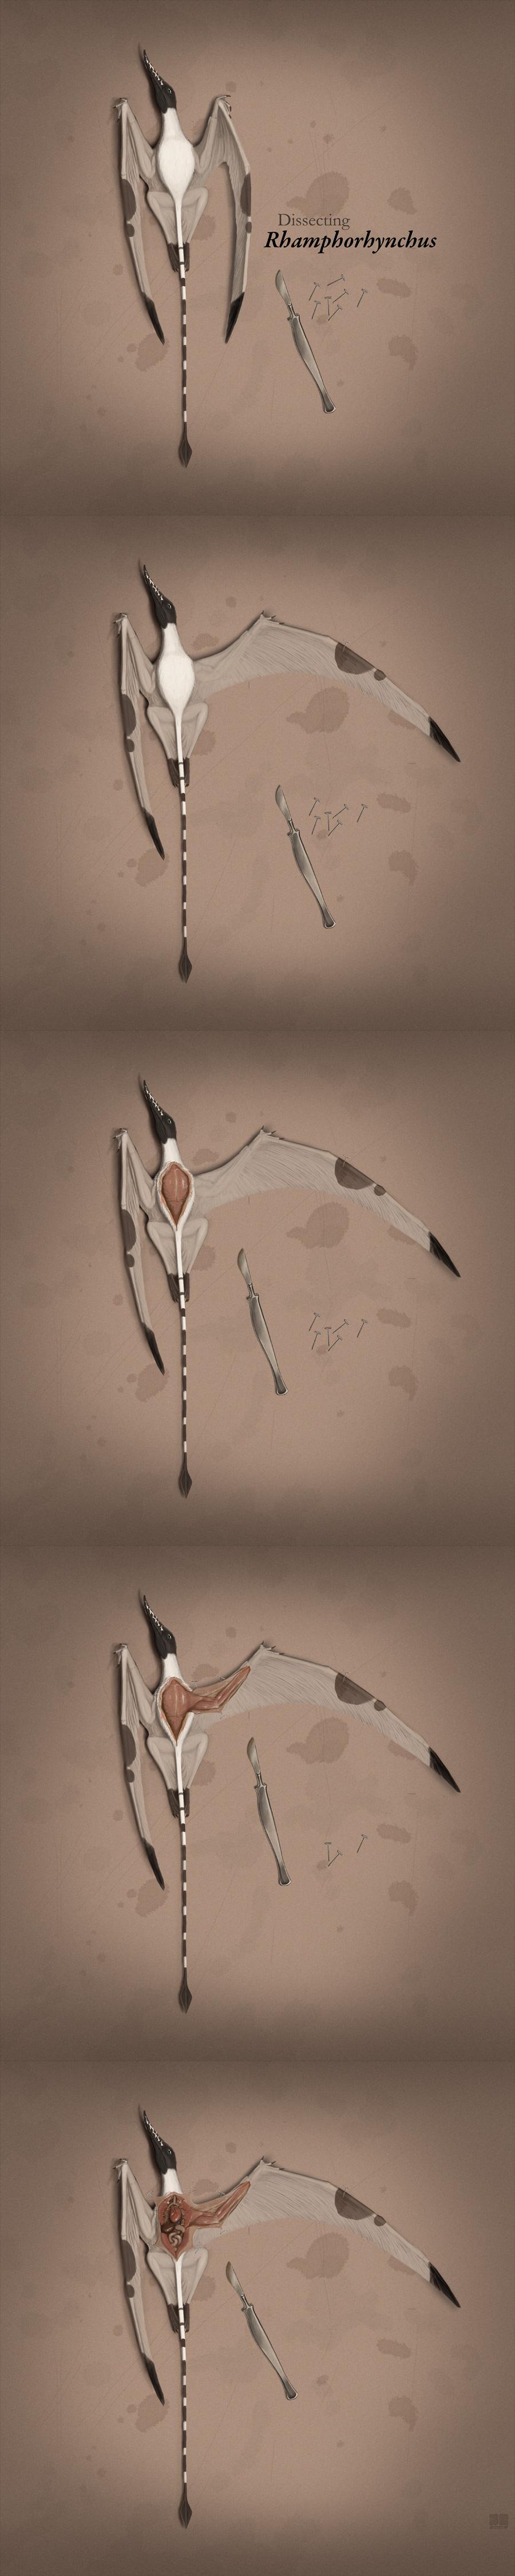 Dissecting Rhamphorhynchus by jconway